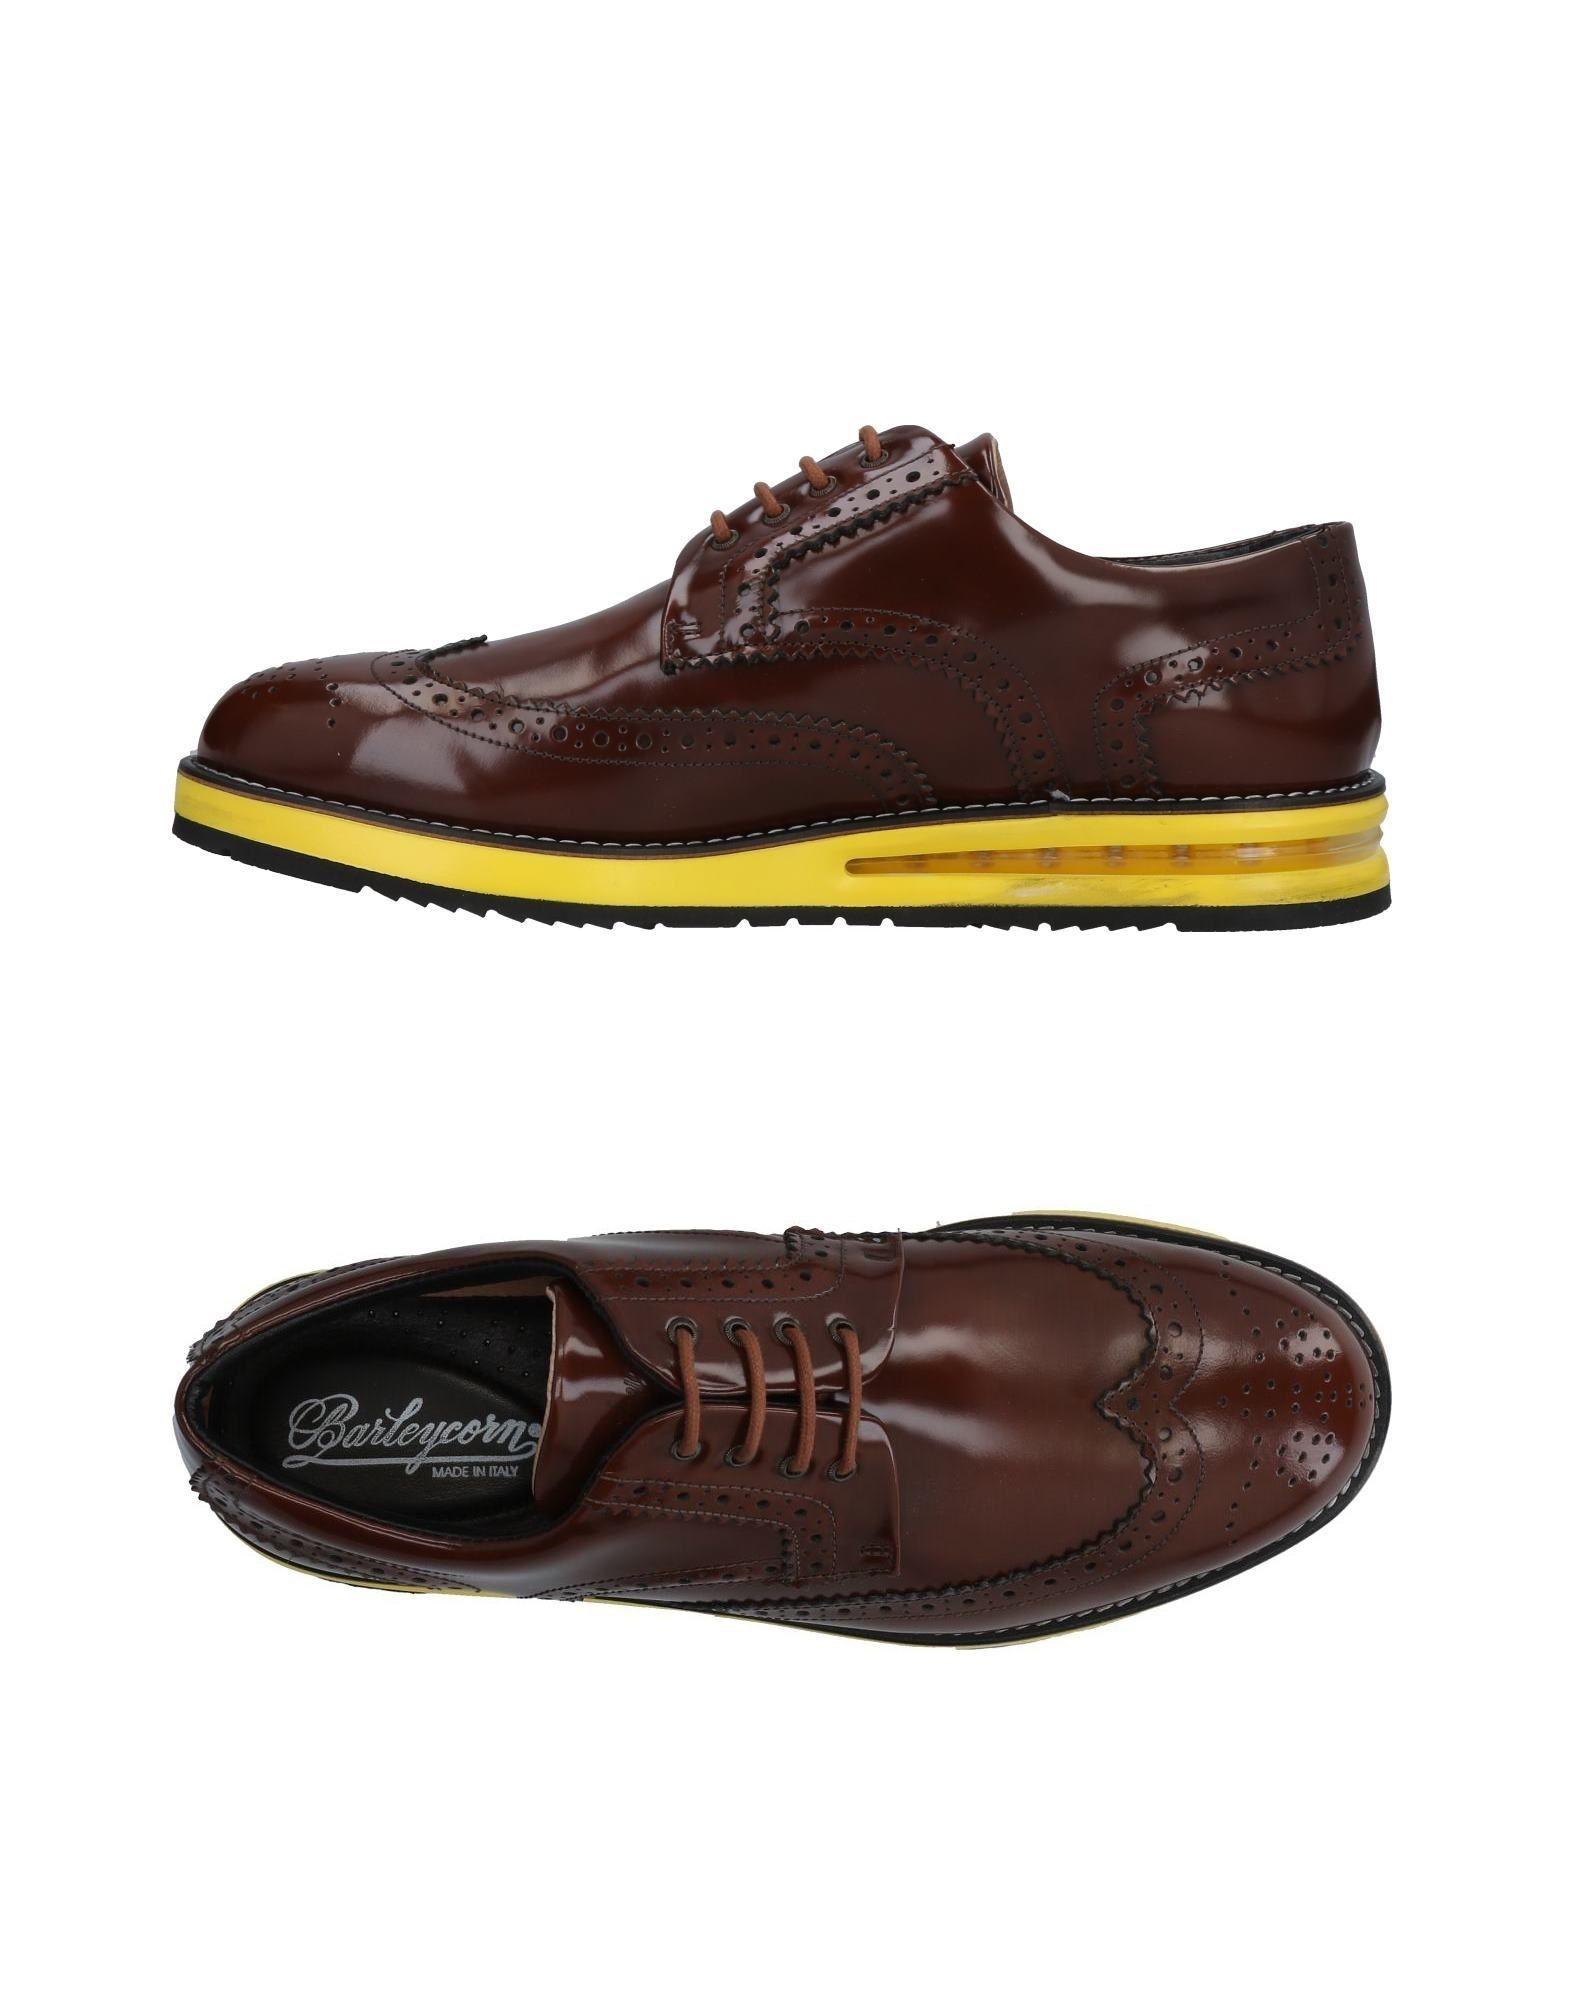 Rabatt echte Schuhe Barleycorn Schnürschuhe Herren  11478920LQ